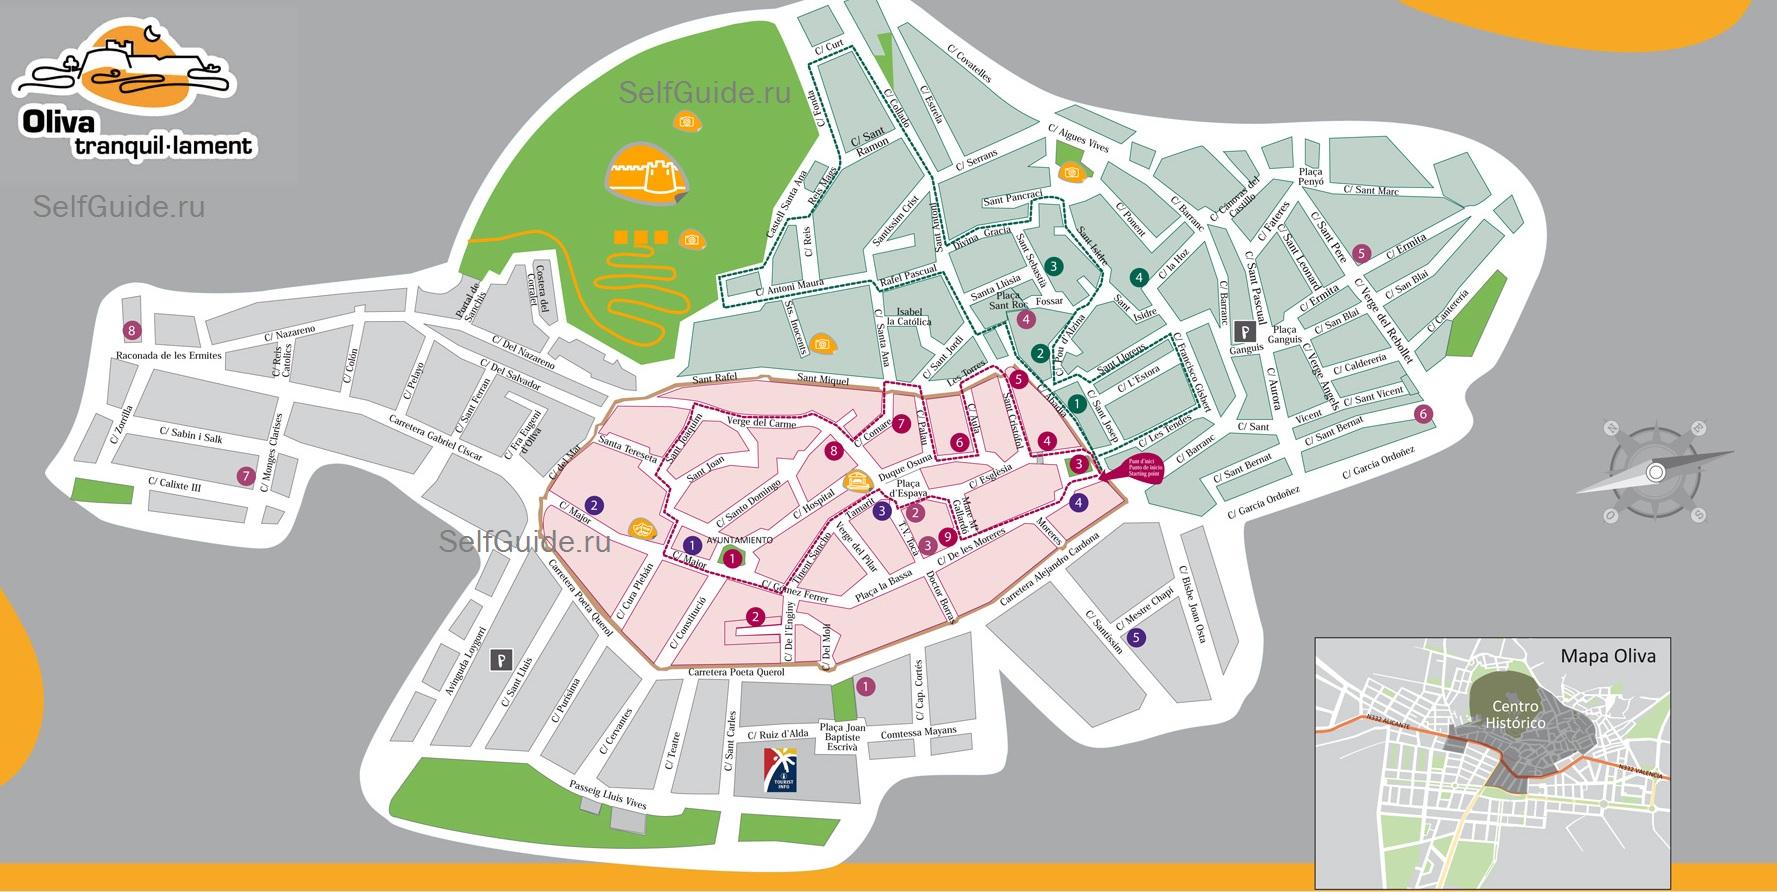 oliva-map